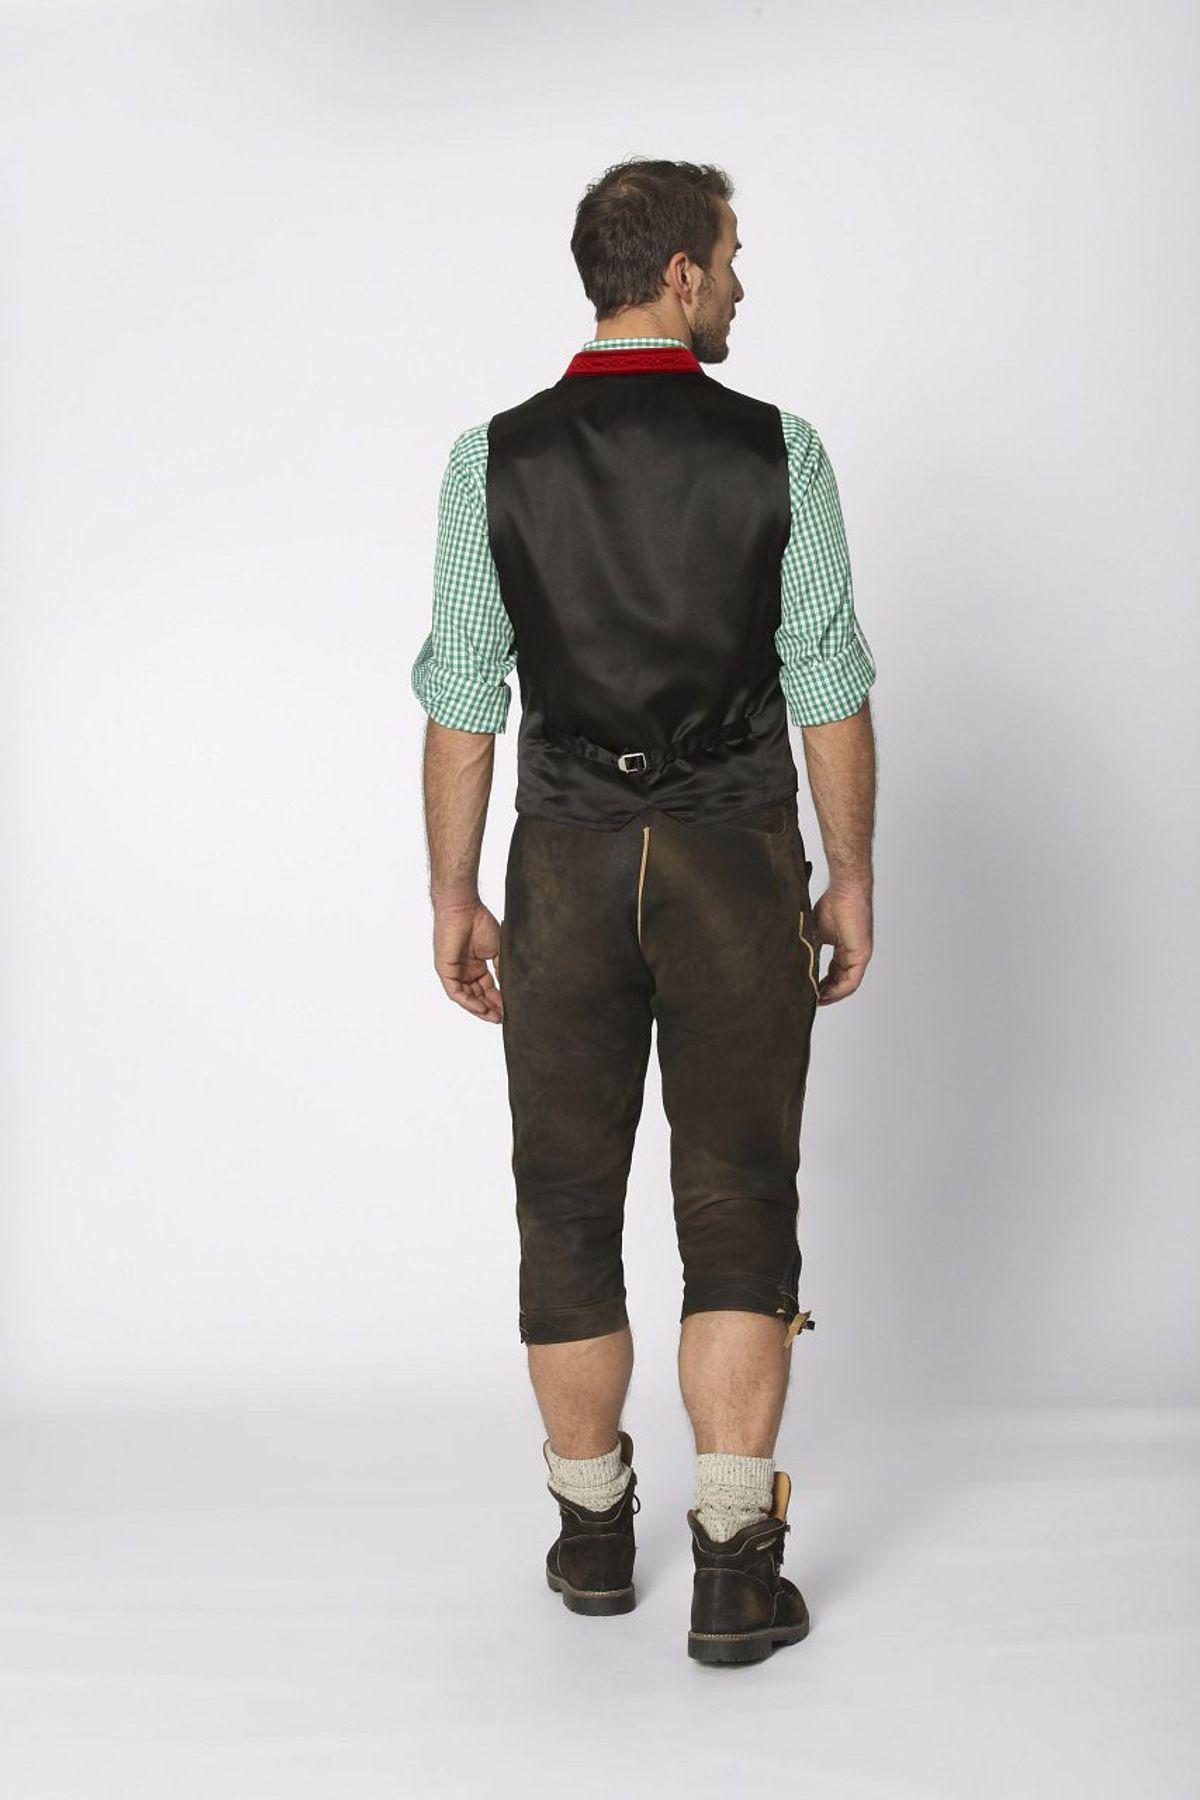 Stockerpoint - Herren Trachten Weste in verschiedenen Farbtönen, Calzado – Bild 9